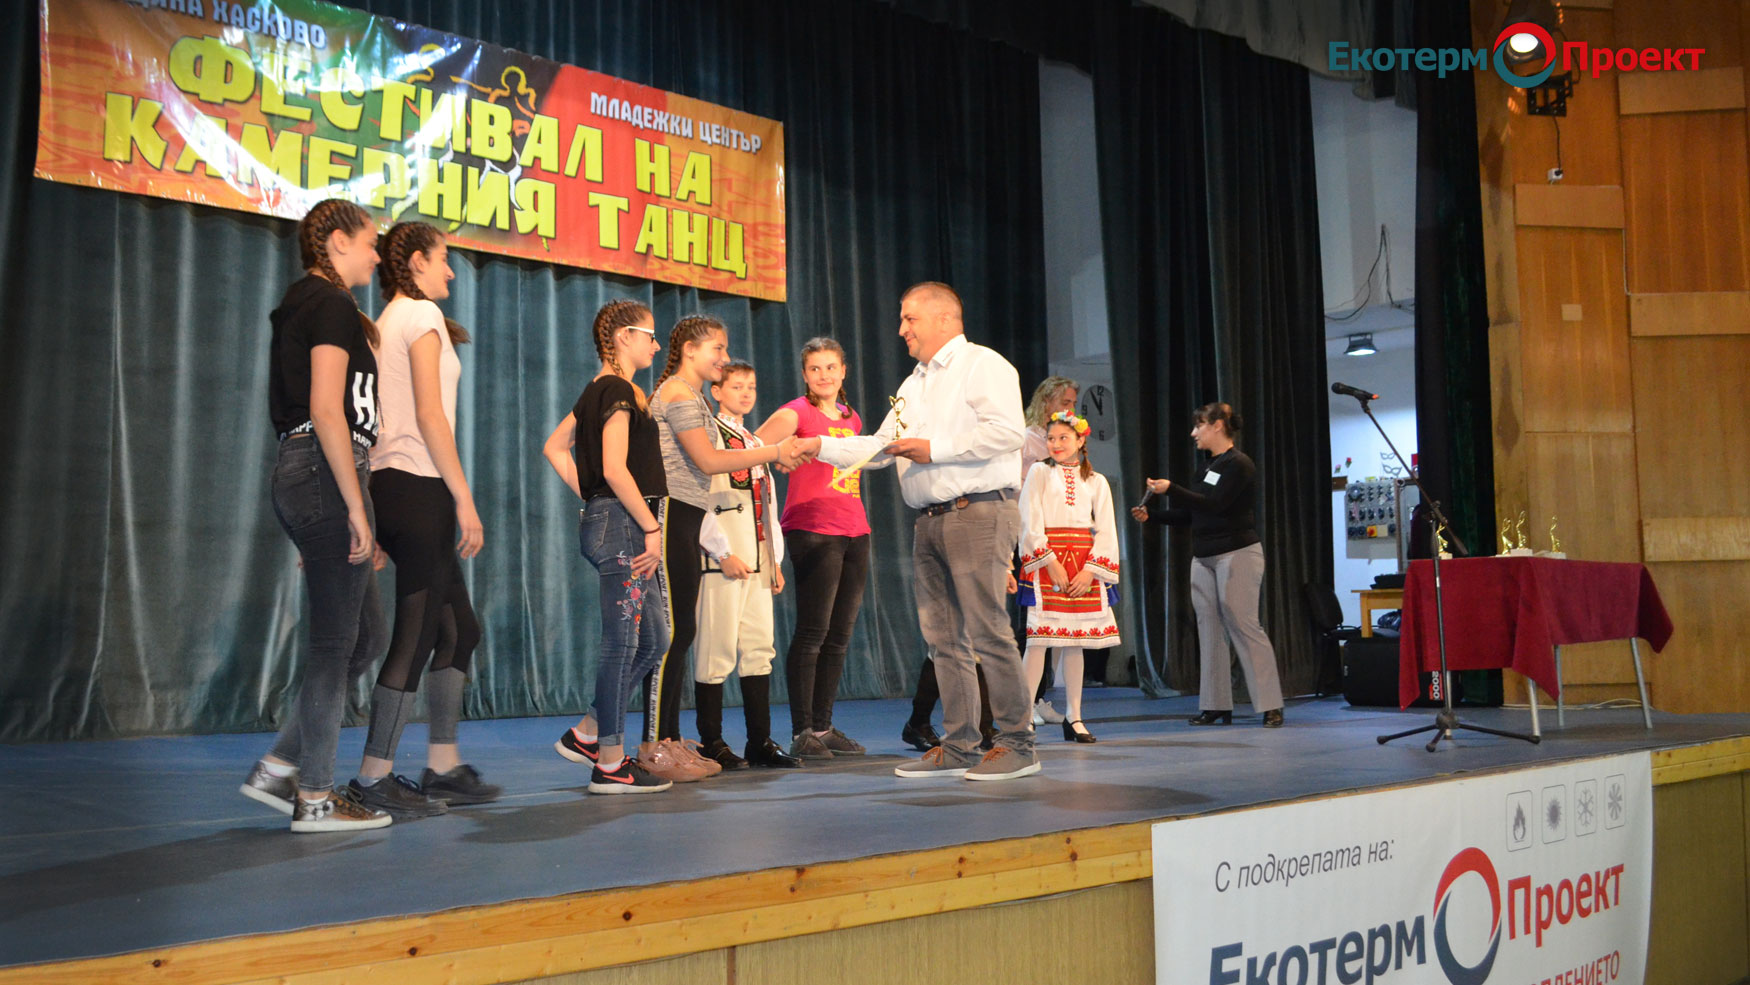 Ekoterm-Proekt-dance-donation-03_04-2019-e